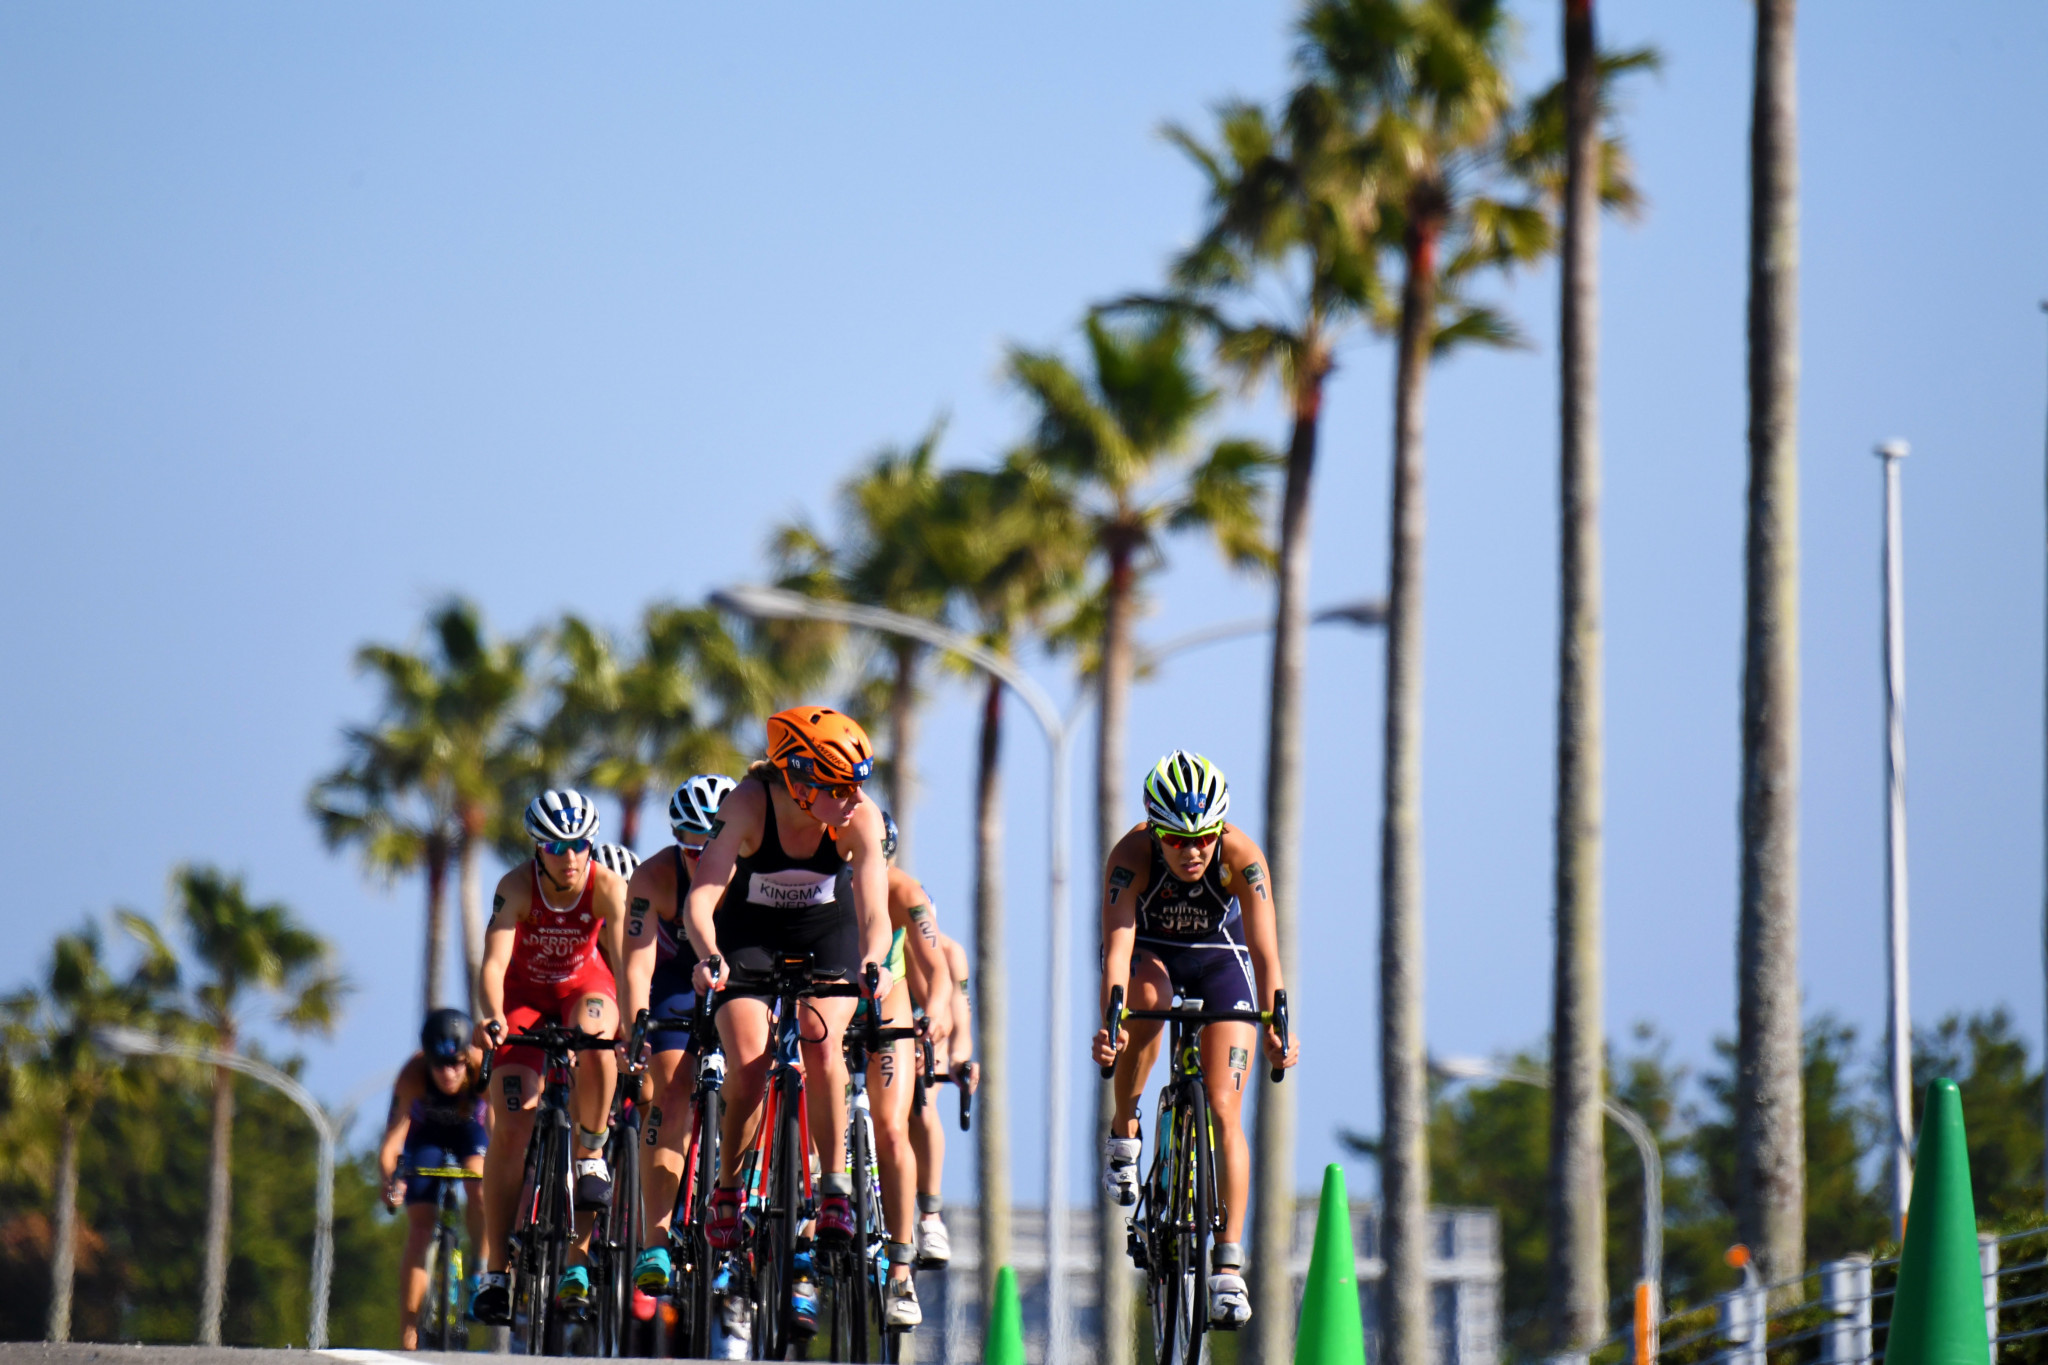 Belgium has gold medal prospects in both men's and women's elite races in tomorrow's ITU World Cup in Miyazaki ©ITU